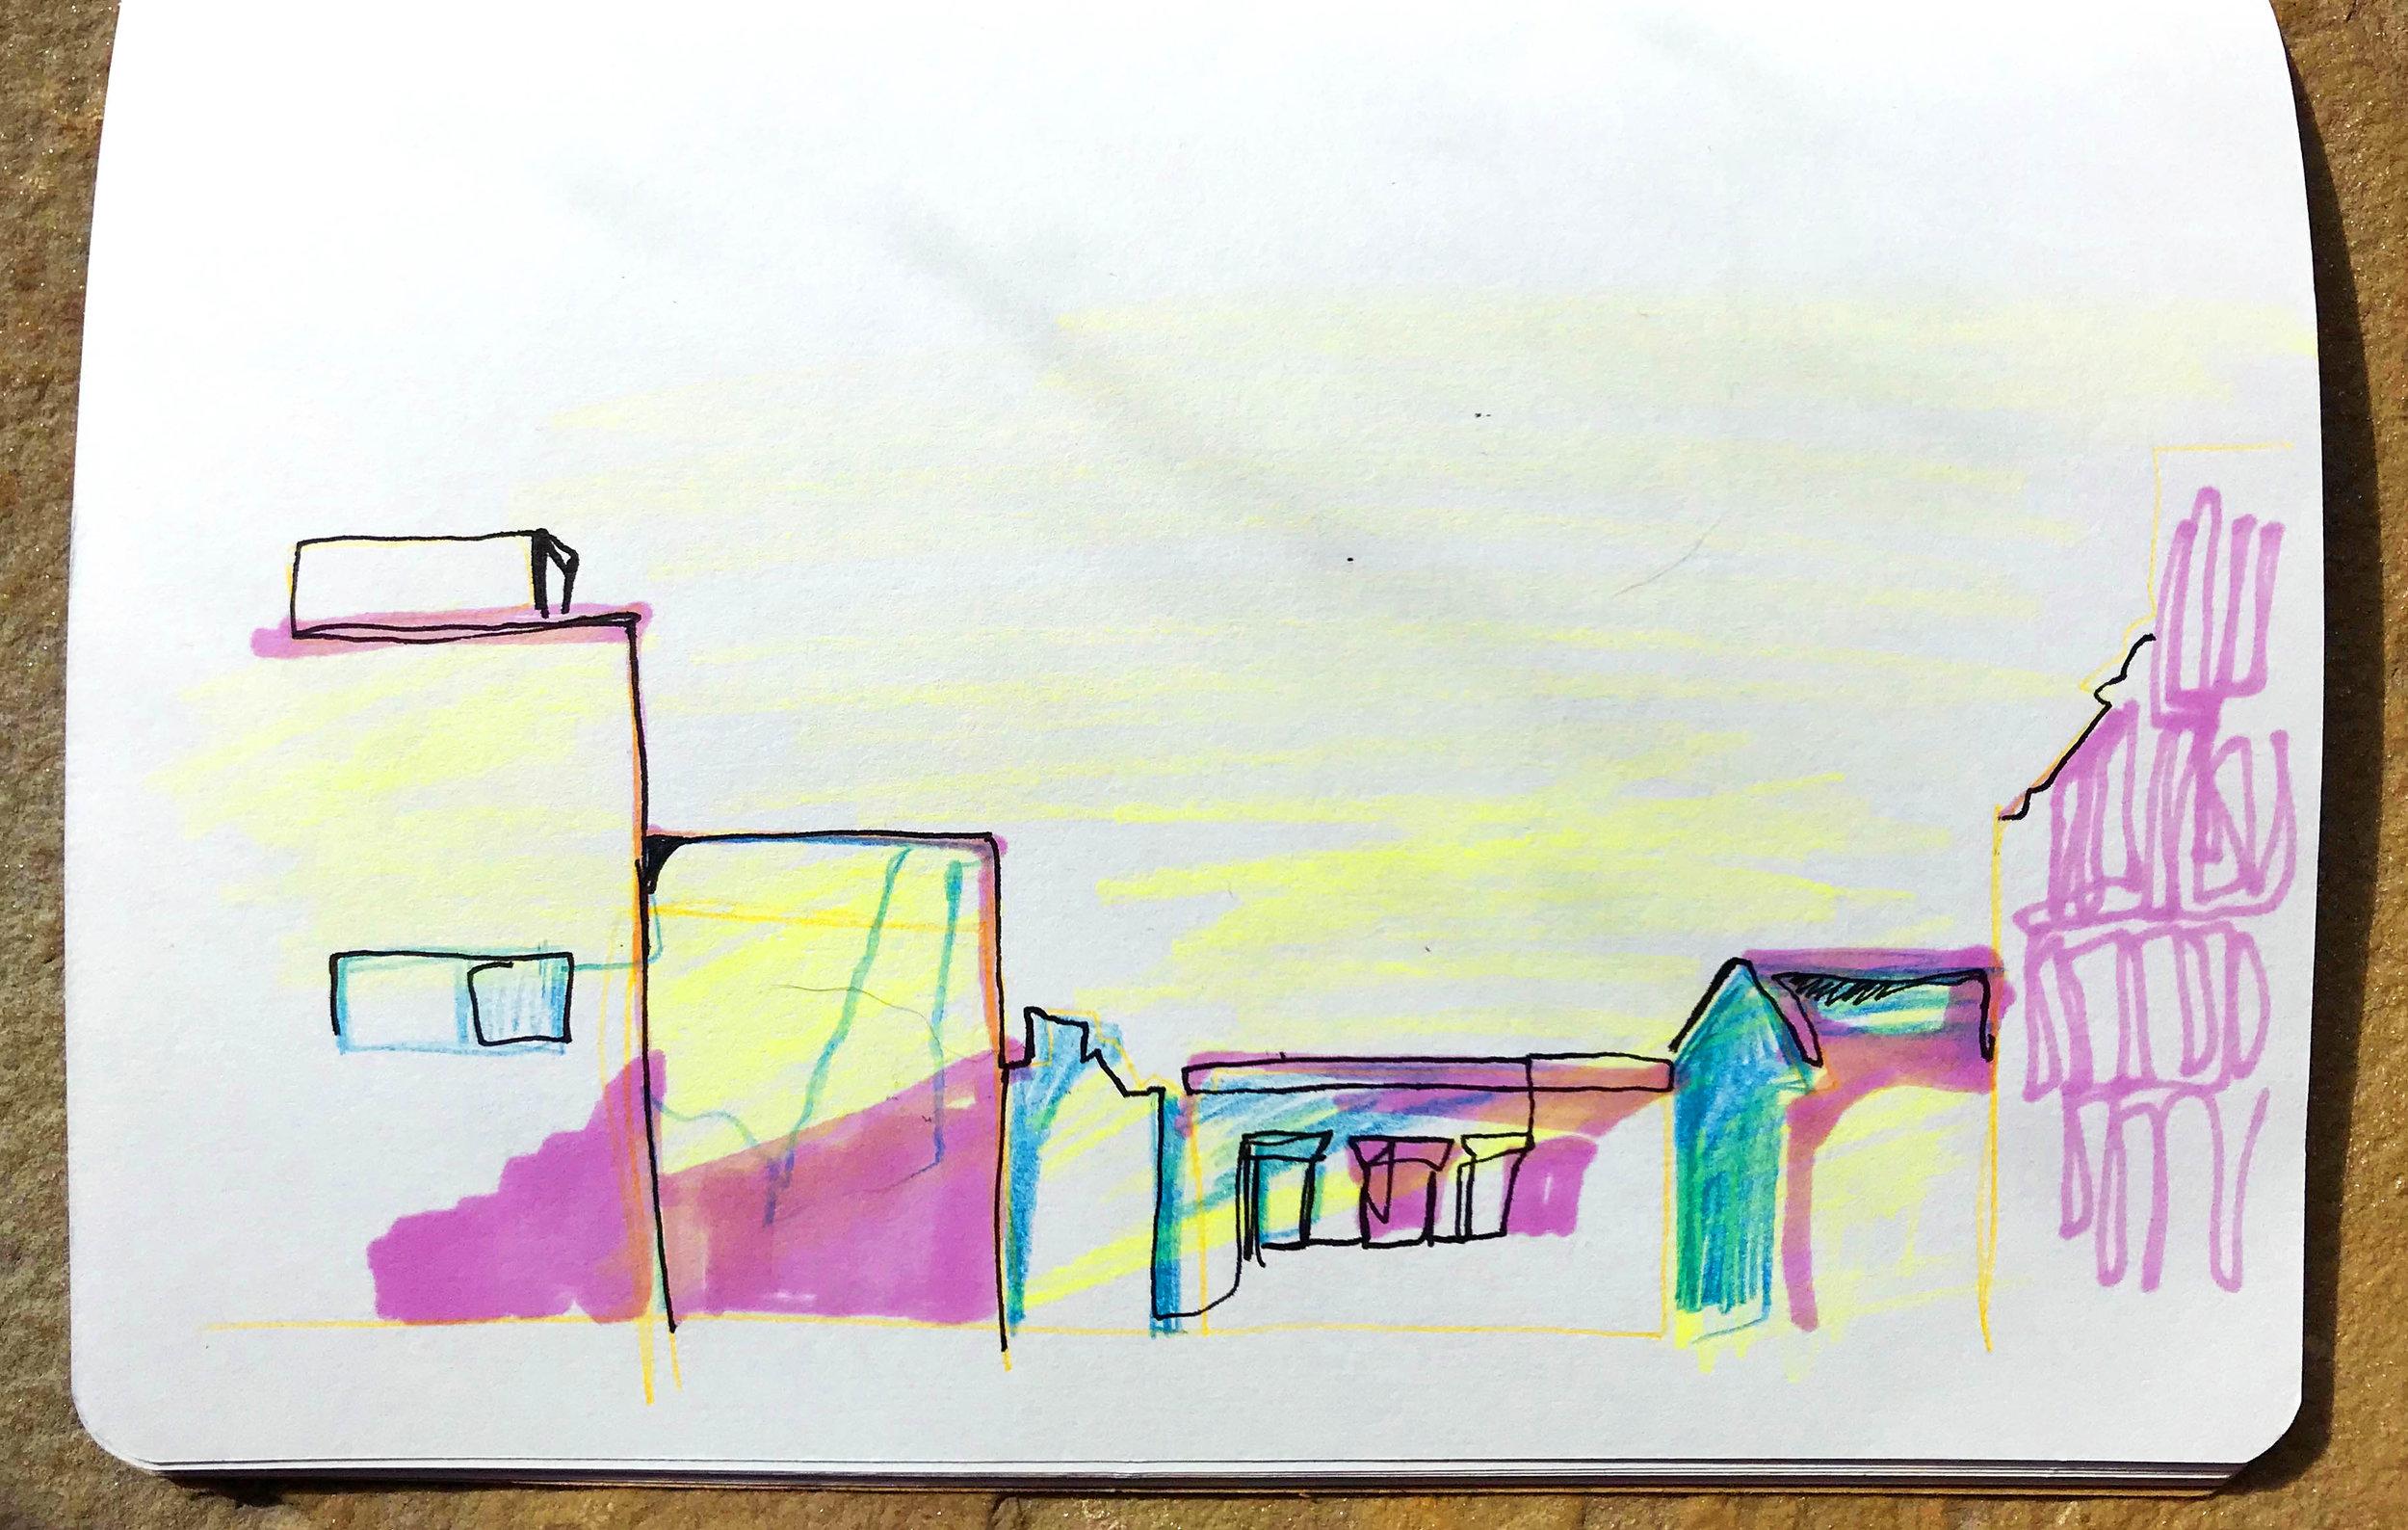 Stuco sketching 05 Holly Sharpe.jpg